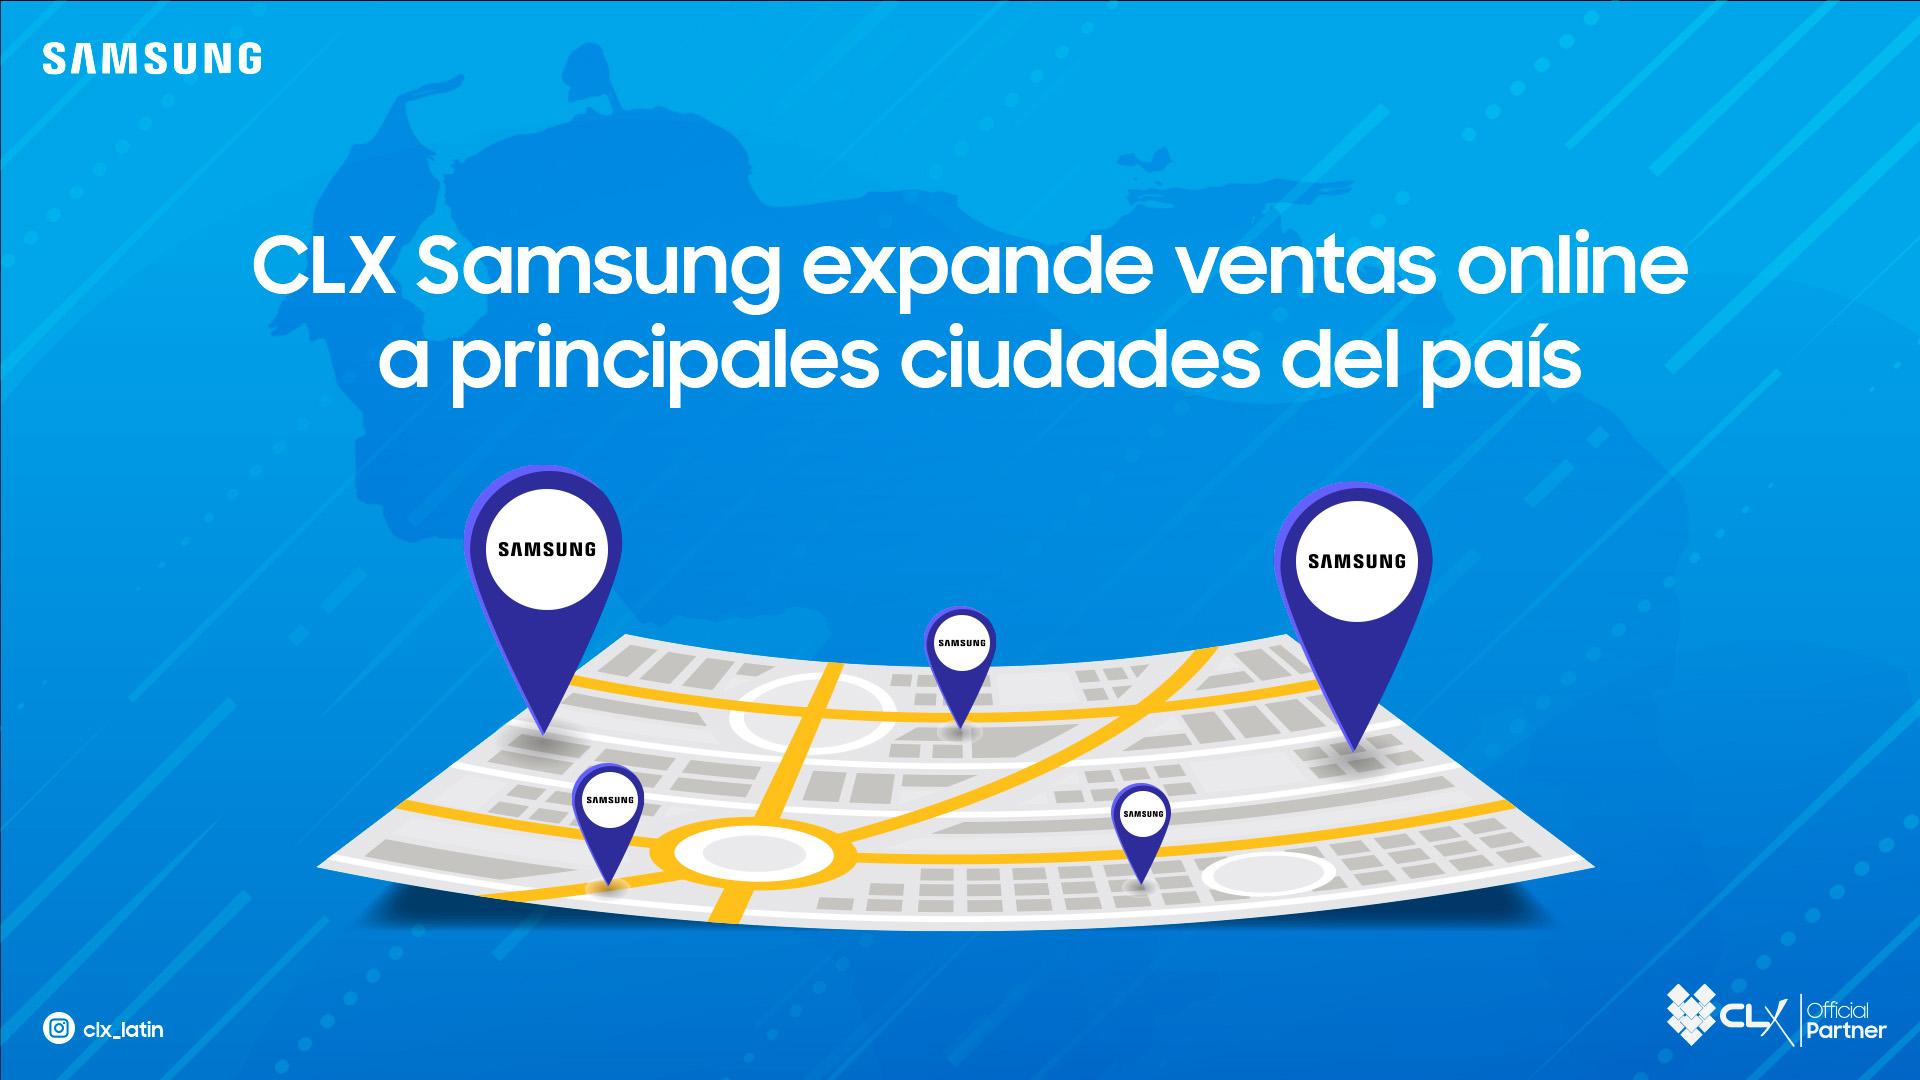 CLX Samsung expande ventas online - clx